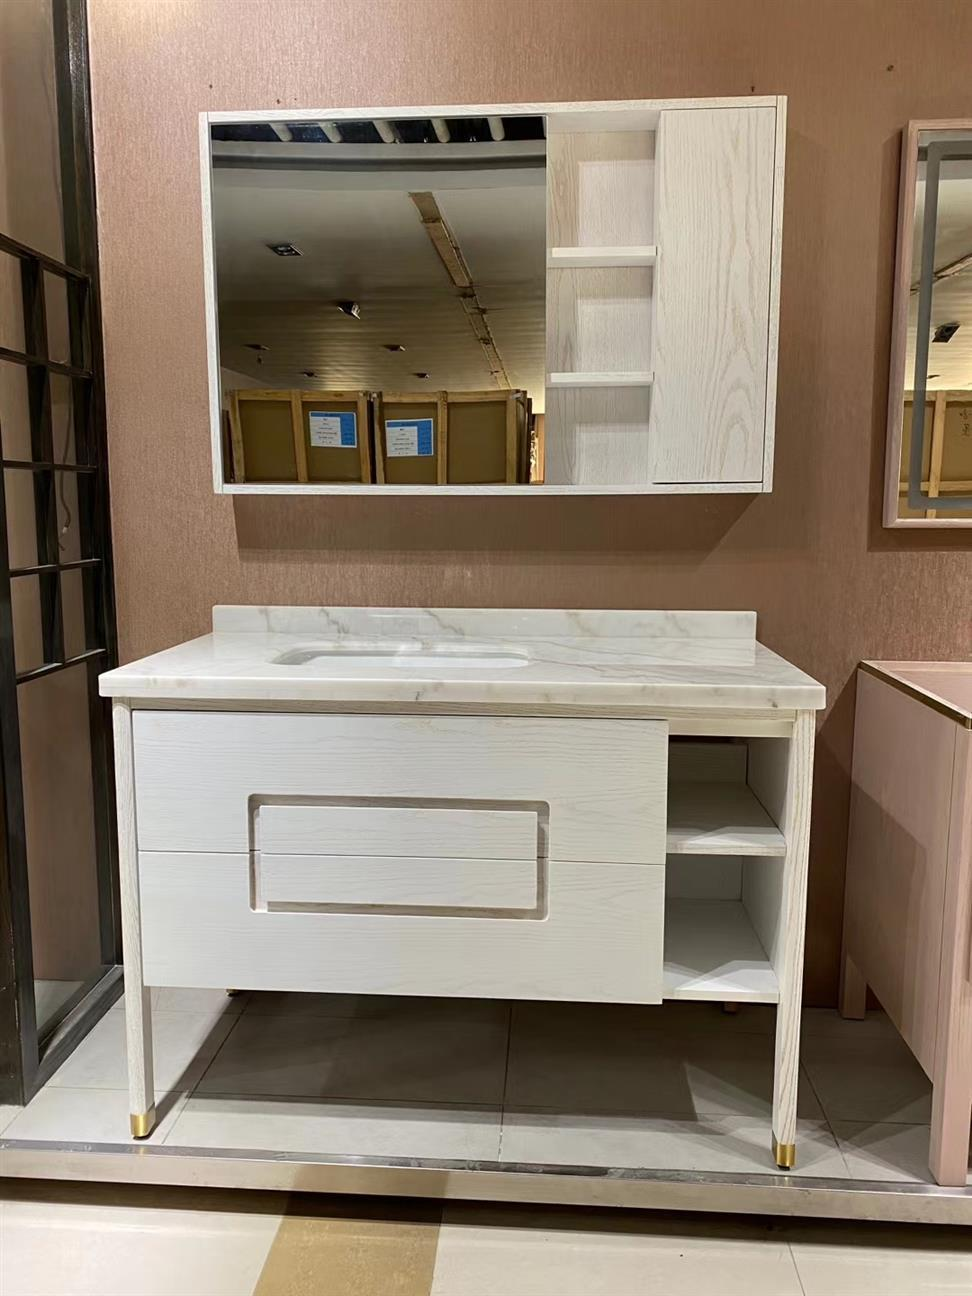 CBM customized manufacture red oak solid wood bathroom vanity